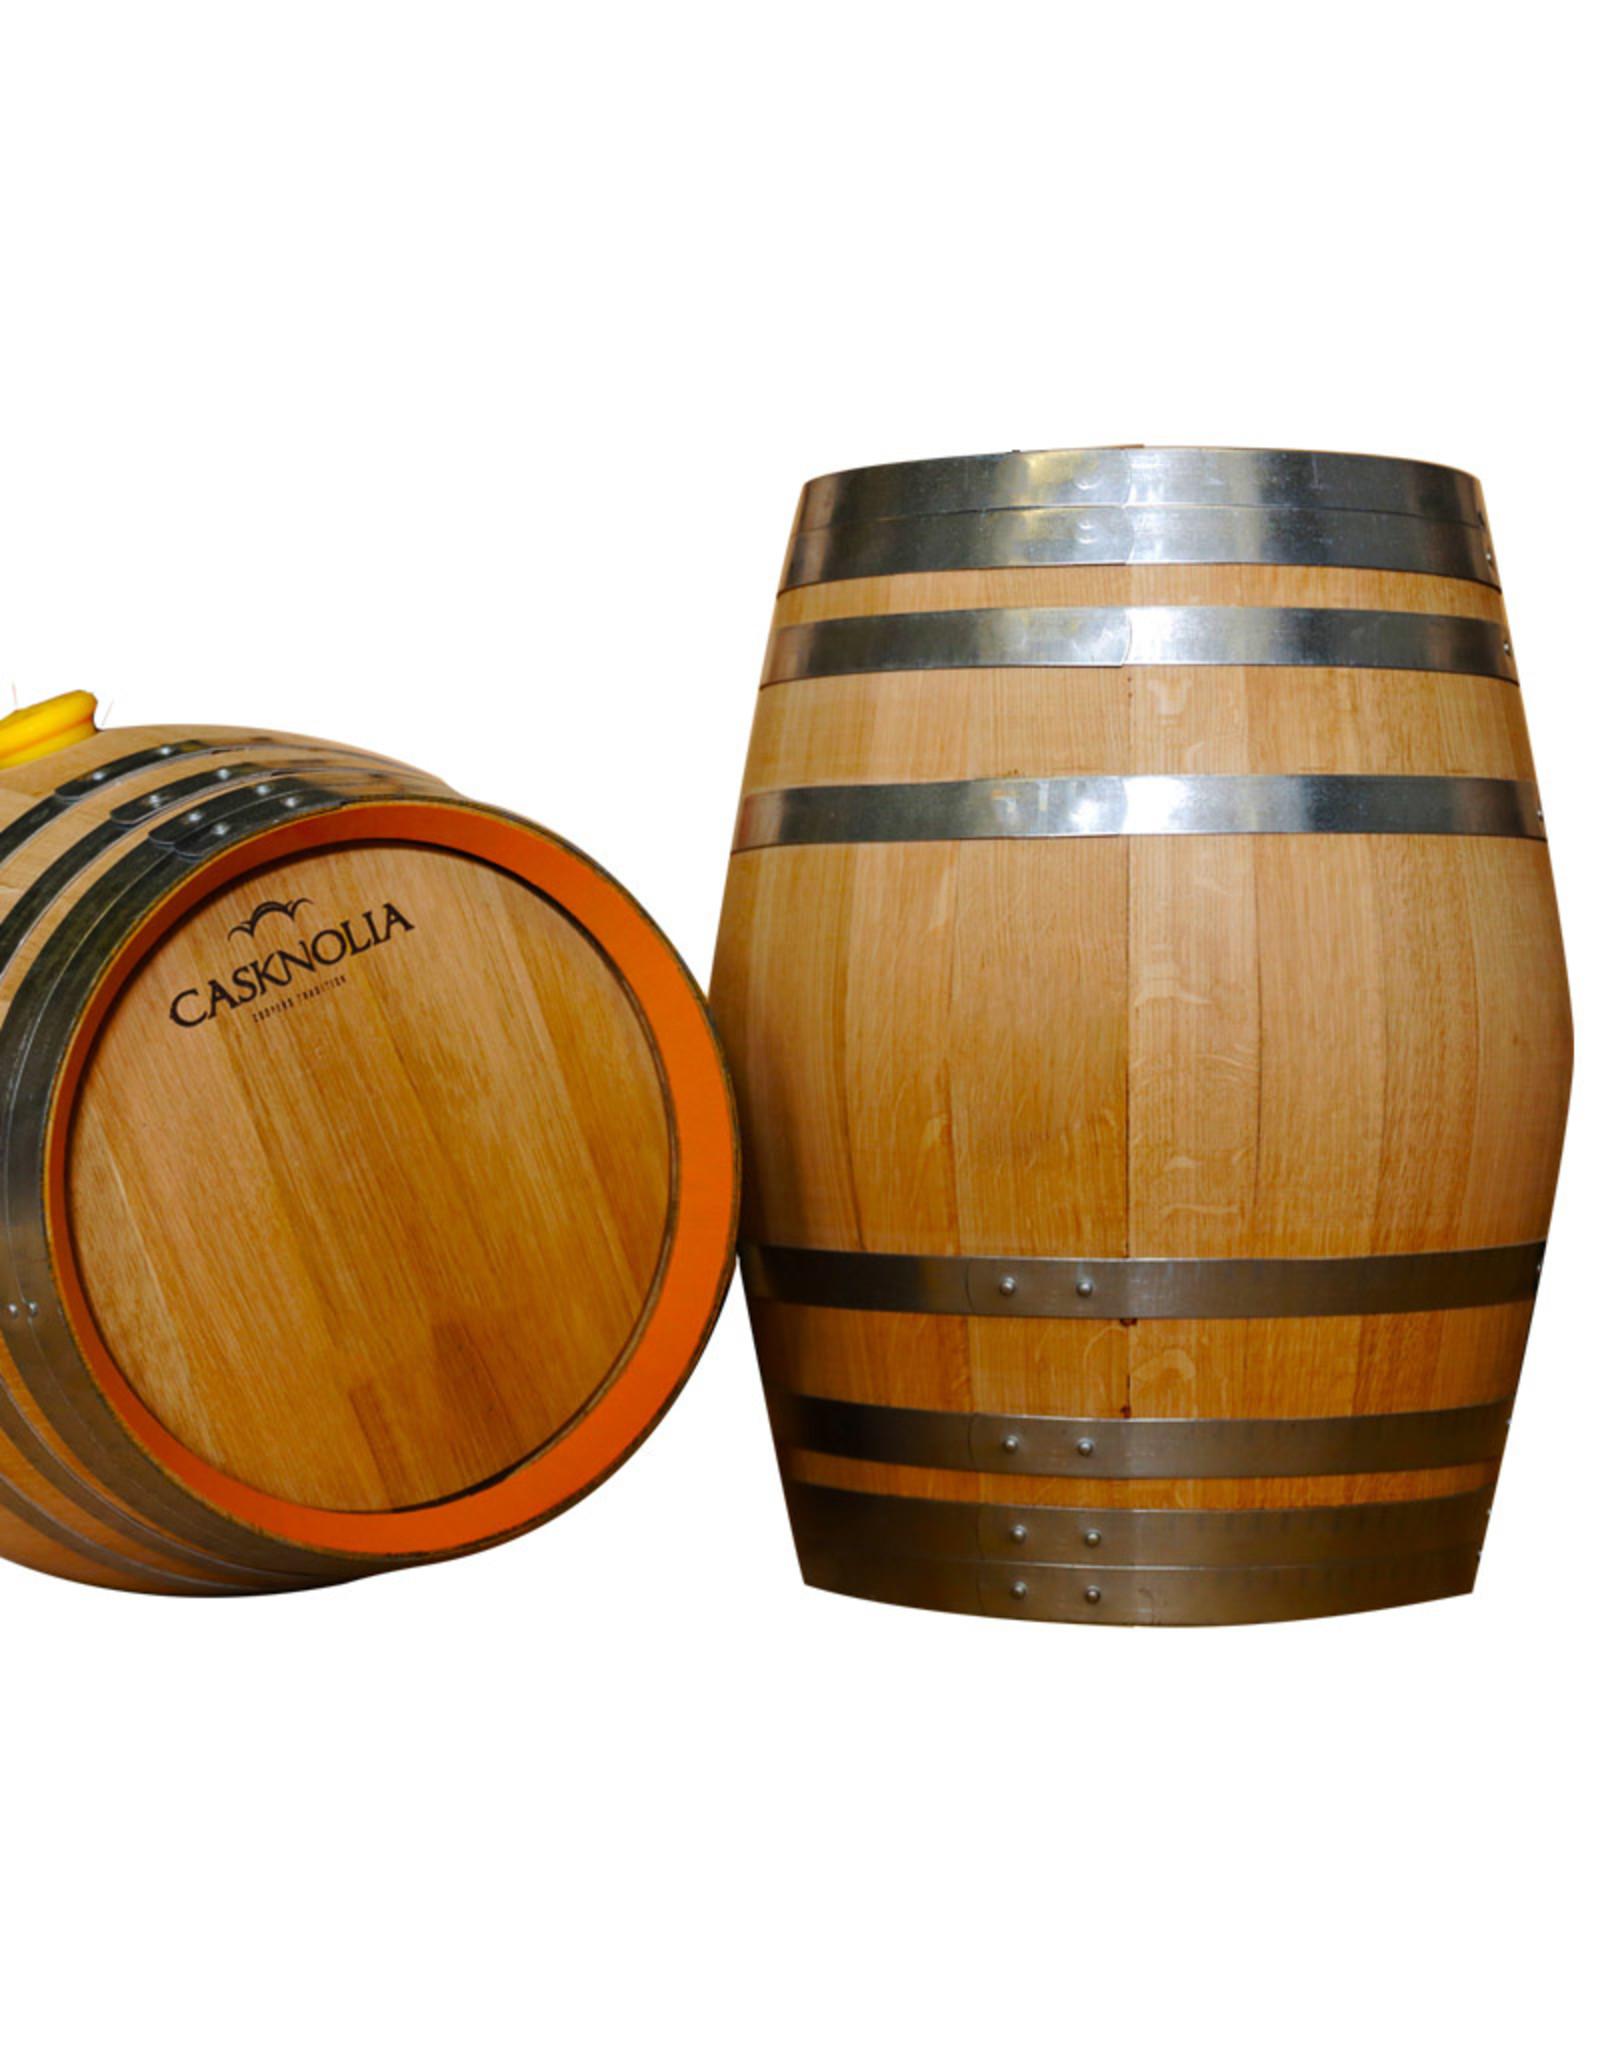 40 L - 500 L CASKNOLIA® SPIRIT BARREL SPANISH OAK